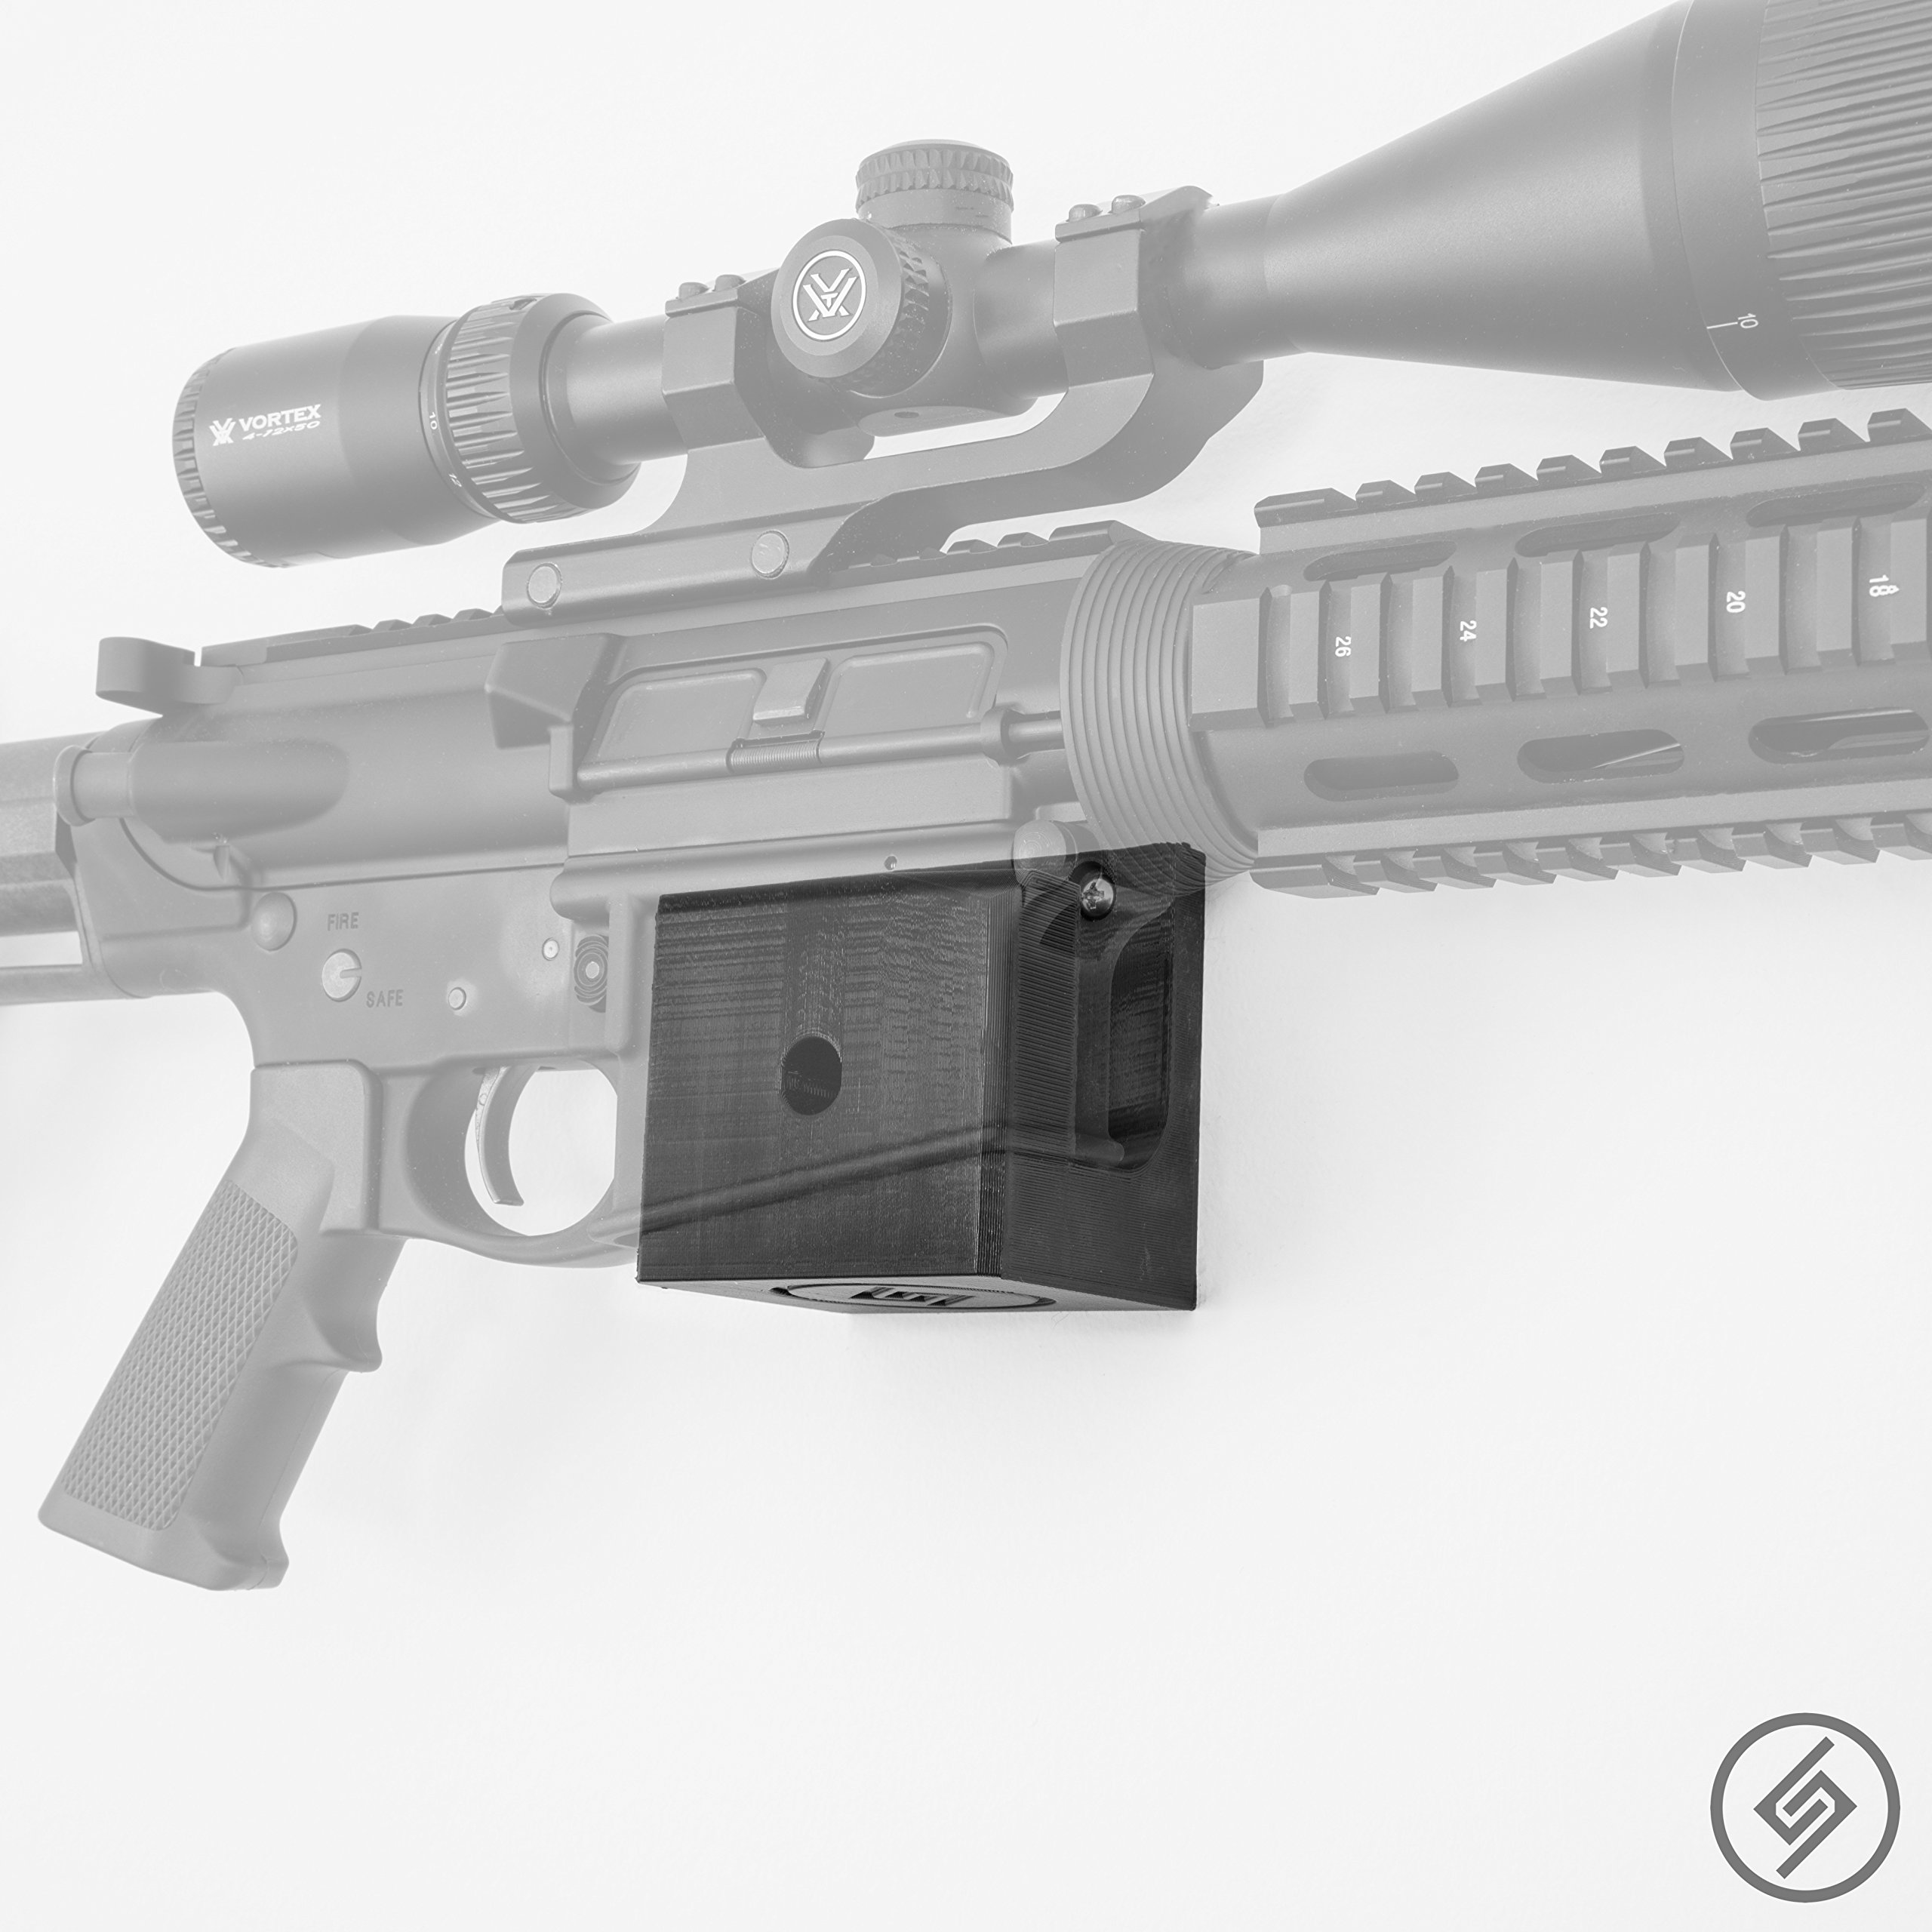 AR-10 Wall Mount | Rifle Display | Wall Storage Organization System | Unique Low Profile Design | Gun Safe Wall Garage | Gun Room Mounting Solution | Spartan Mounts by Spartan Mounts